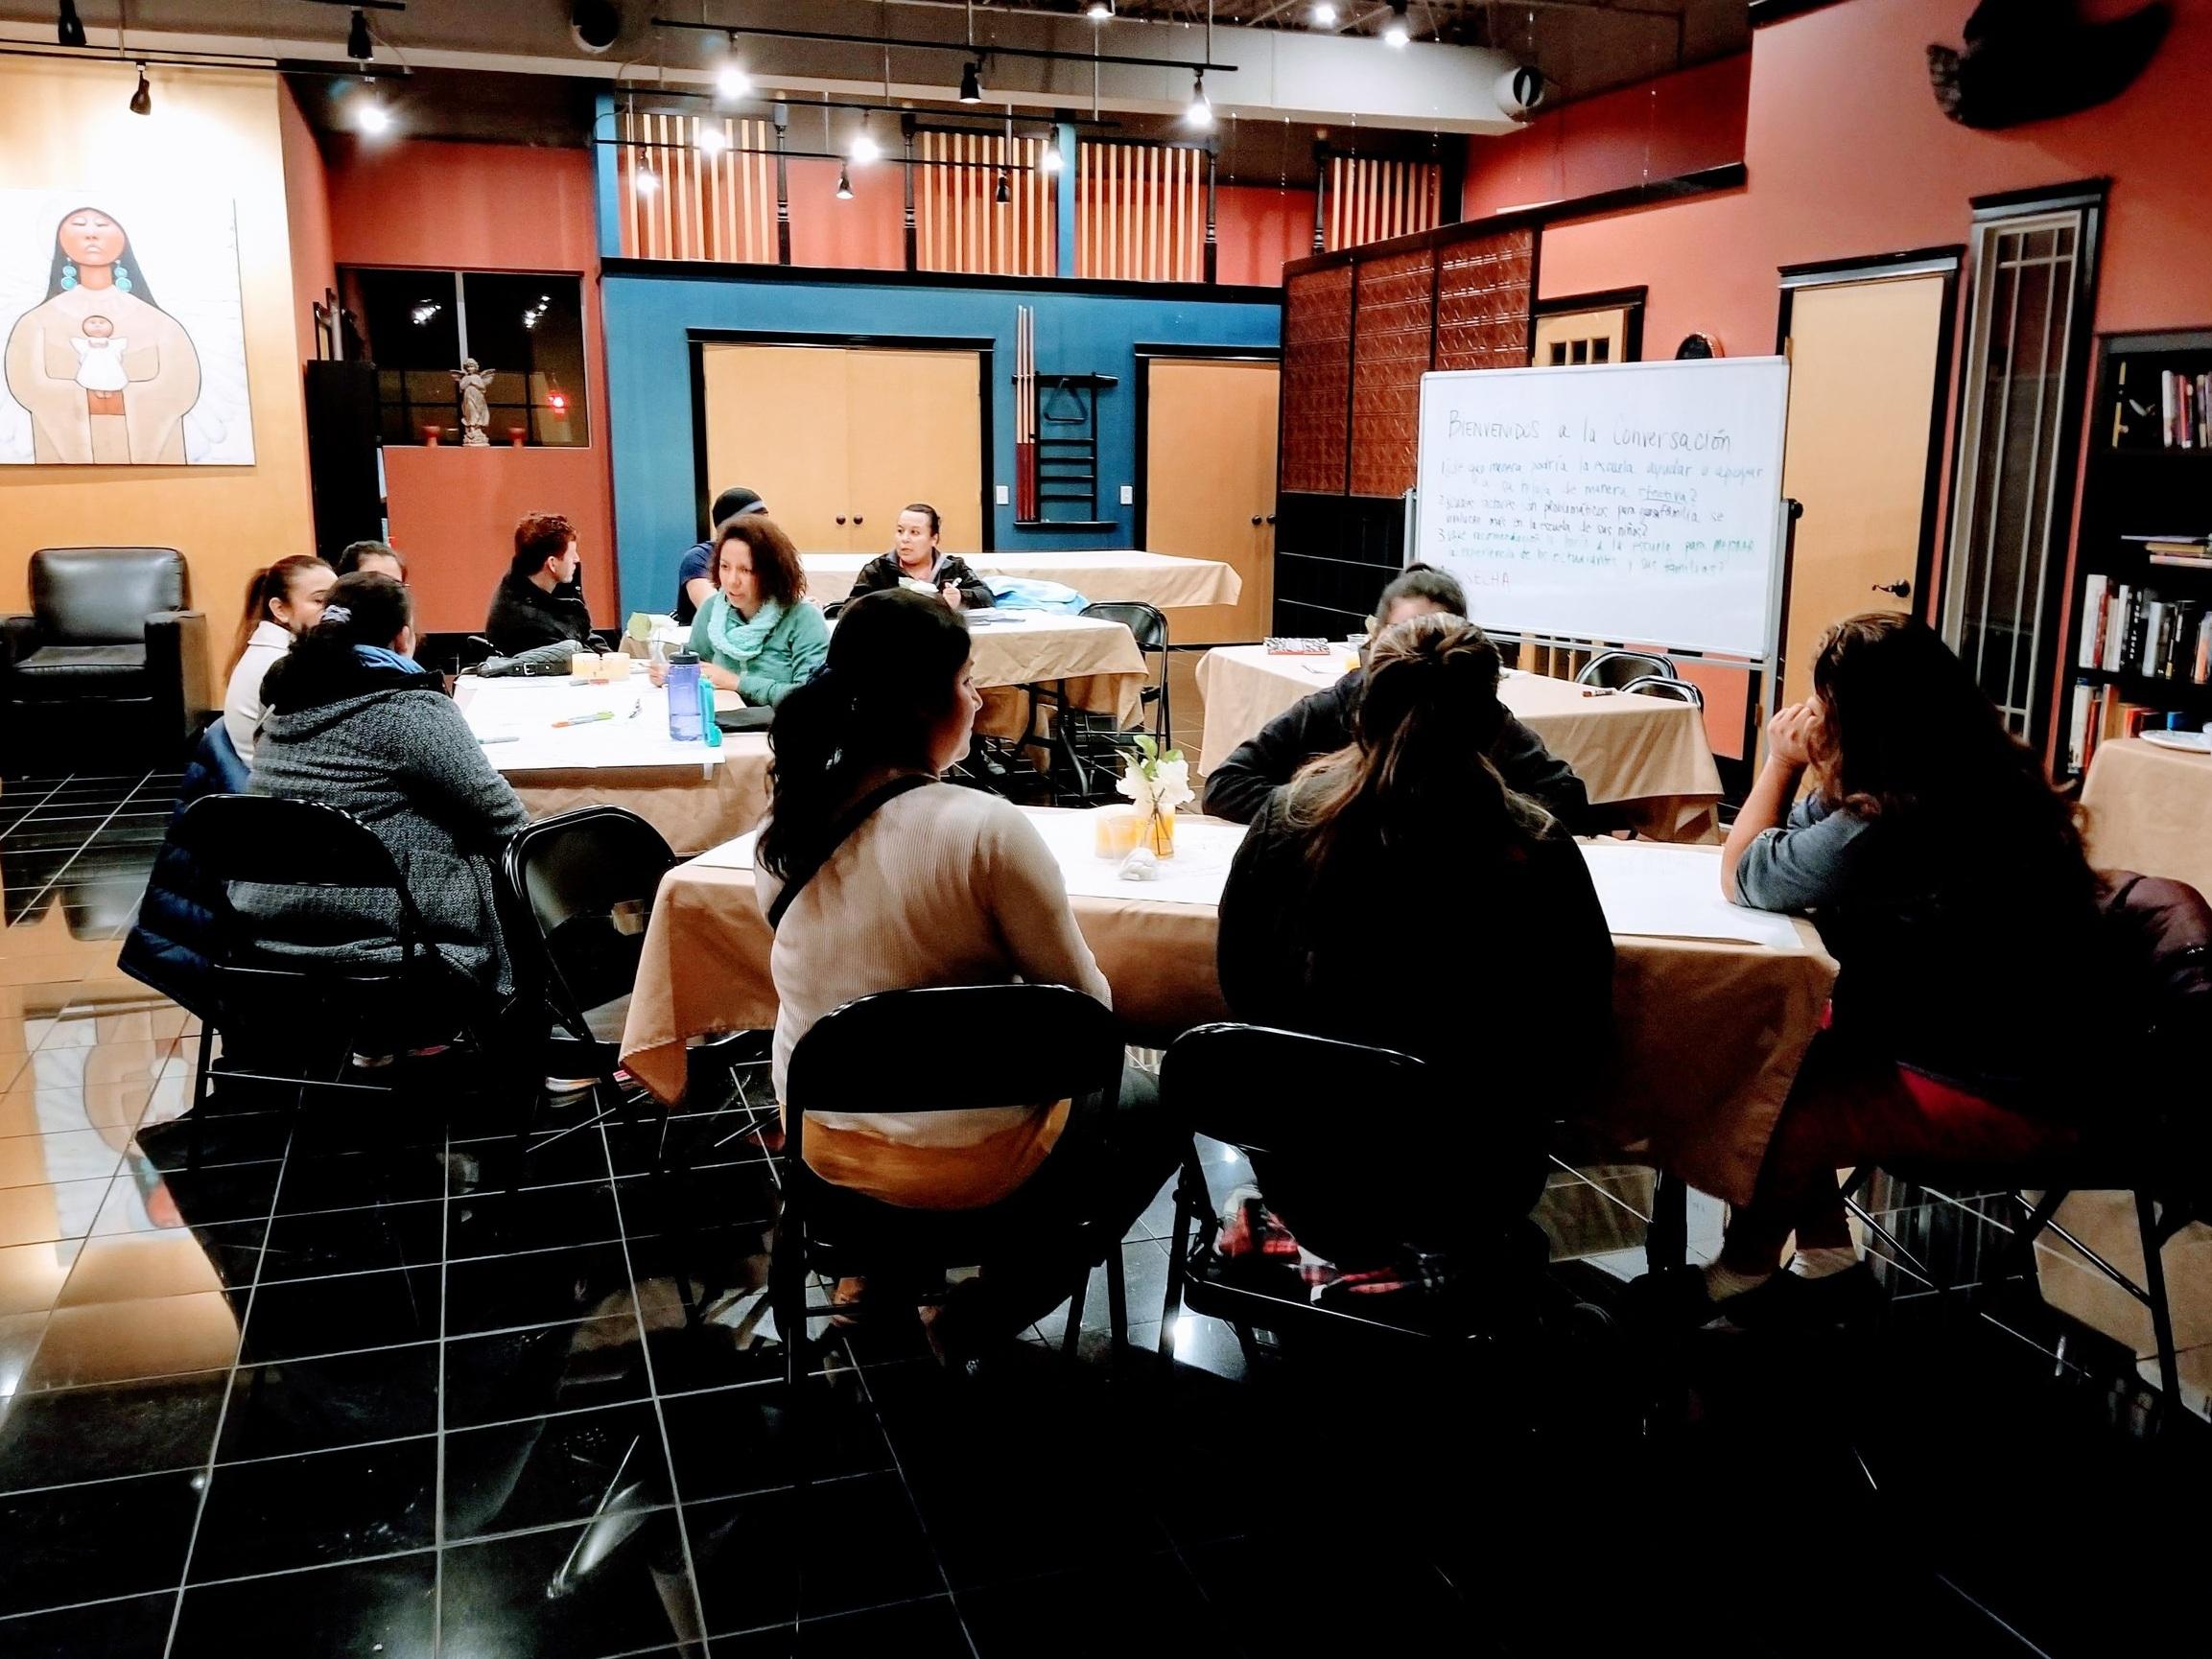 Photo caption: Family engagement workshop at Centro Tyrone Guzman.